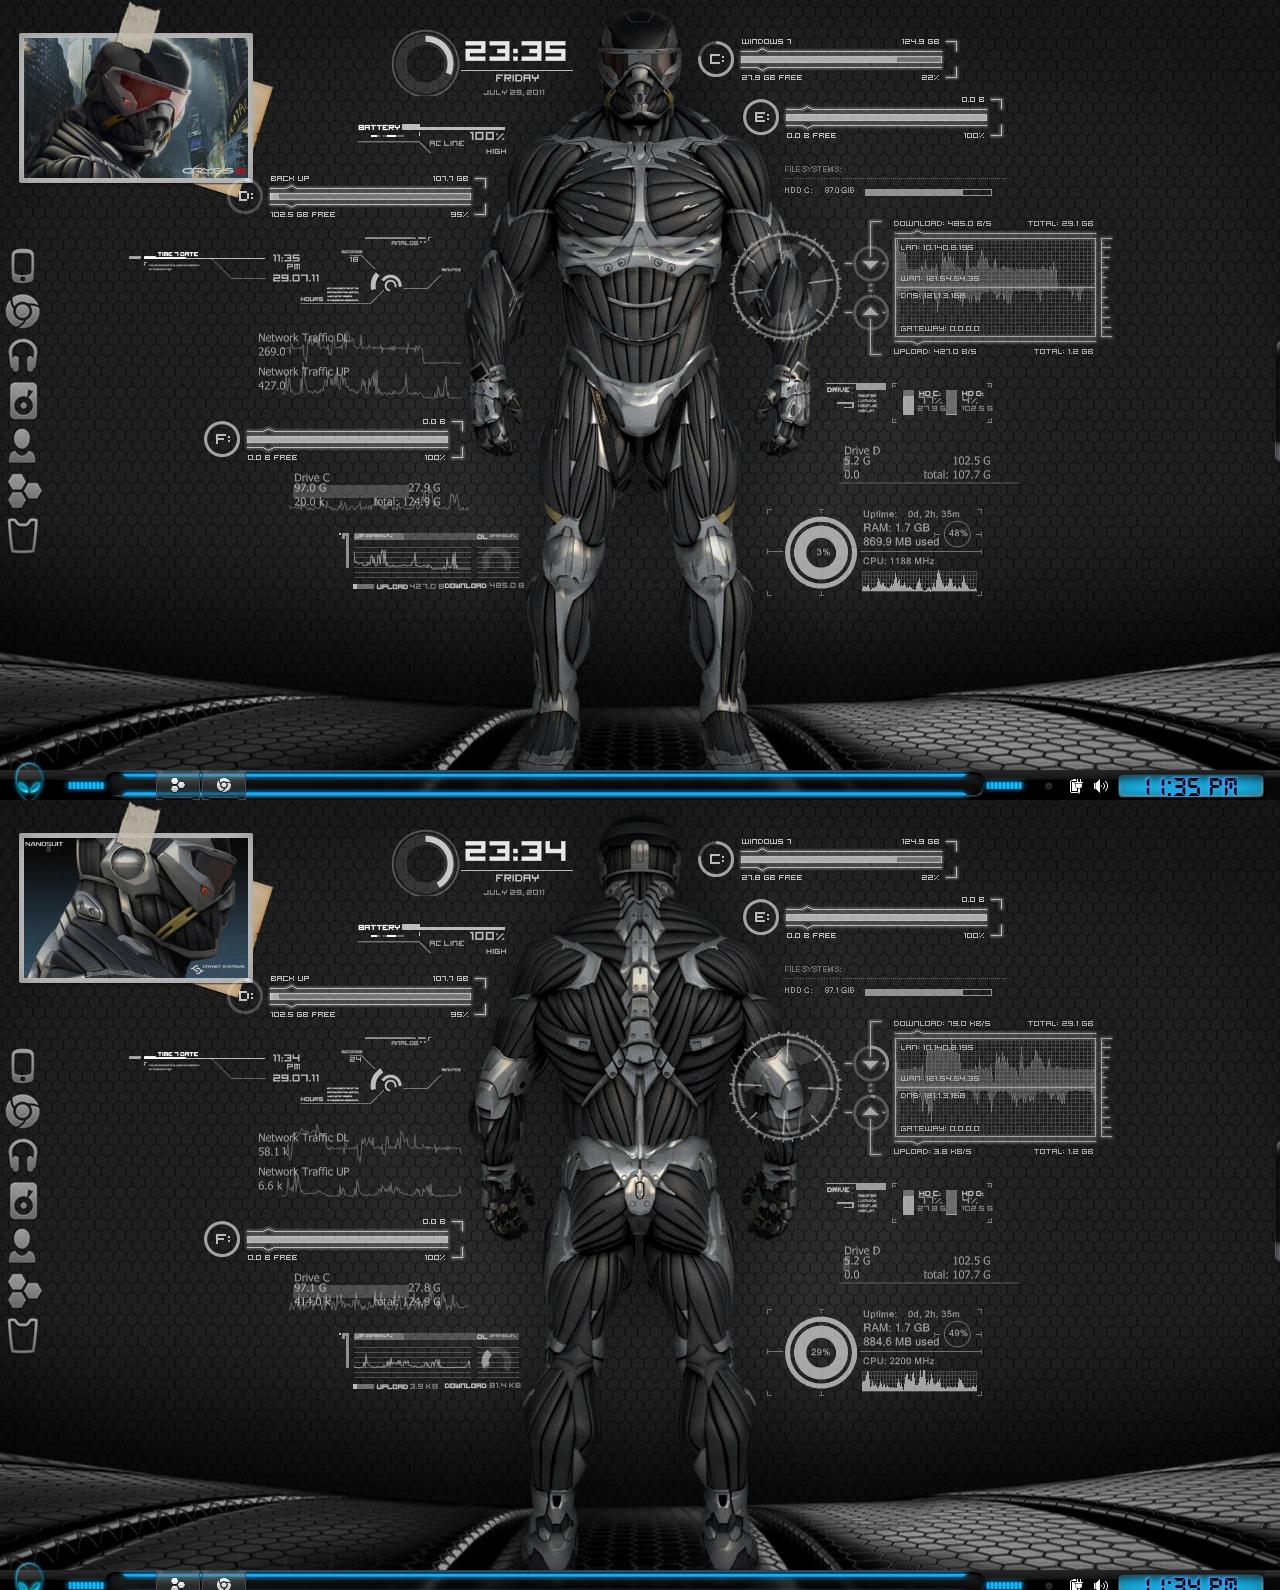 Crysis Warhead Wallpapers PC  supercheatscom